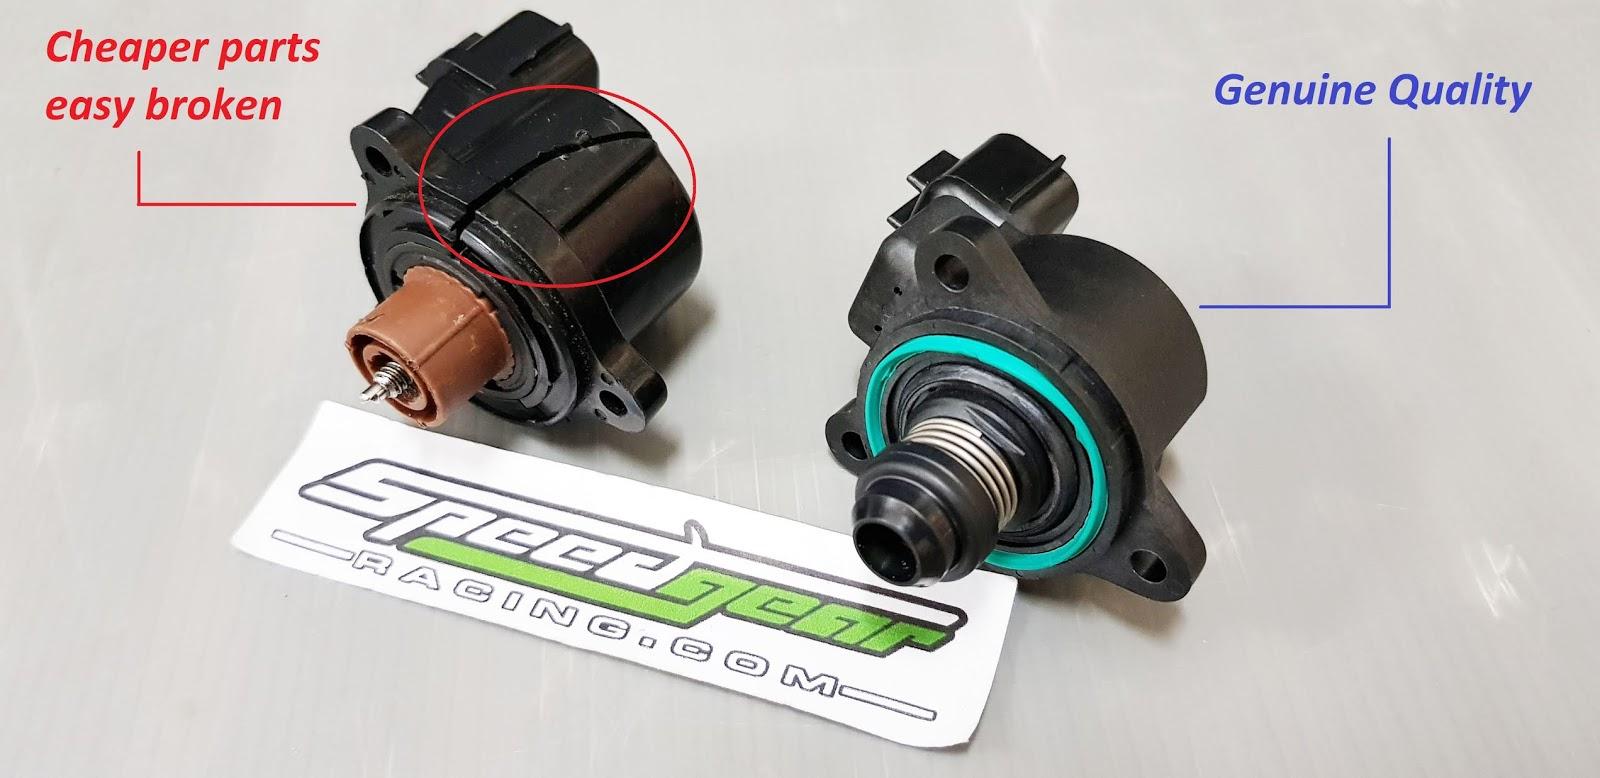 Speedgear Racing: Stepper motor Idle valve 4G18 Lancer CS3 Proton Waja